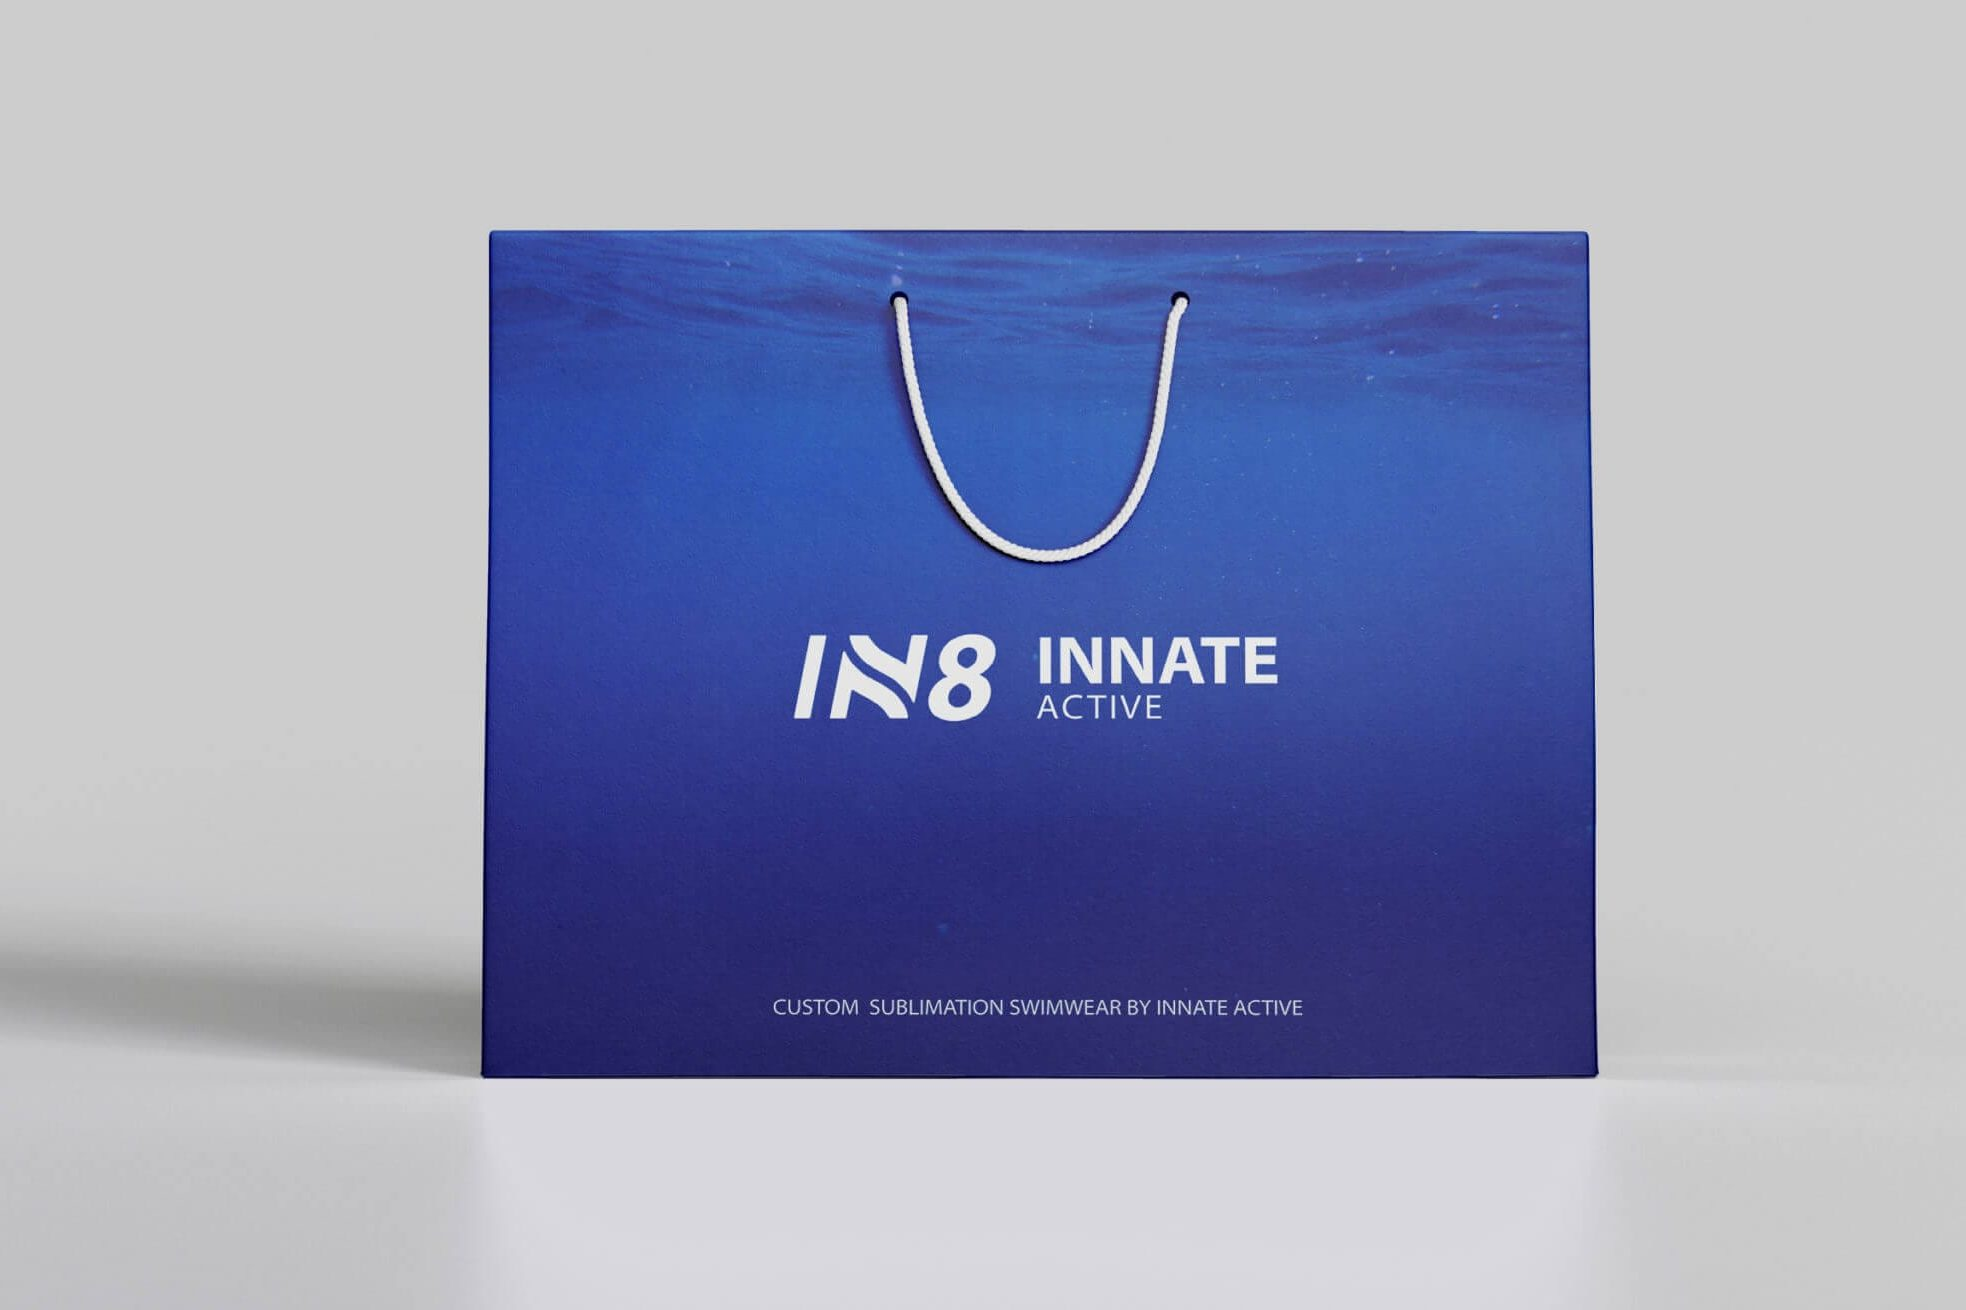 IN8 Active Shopping Bag | IN8 Active logo design